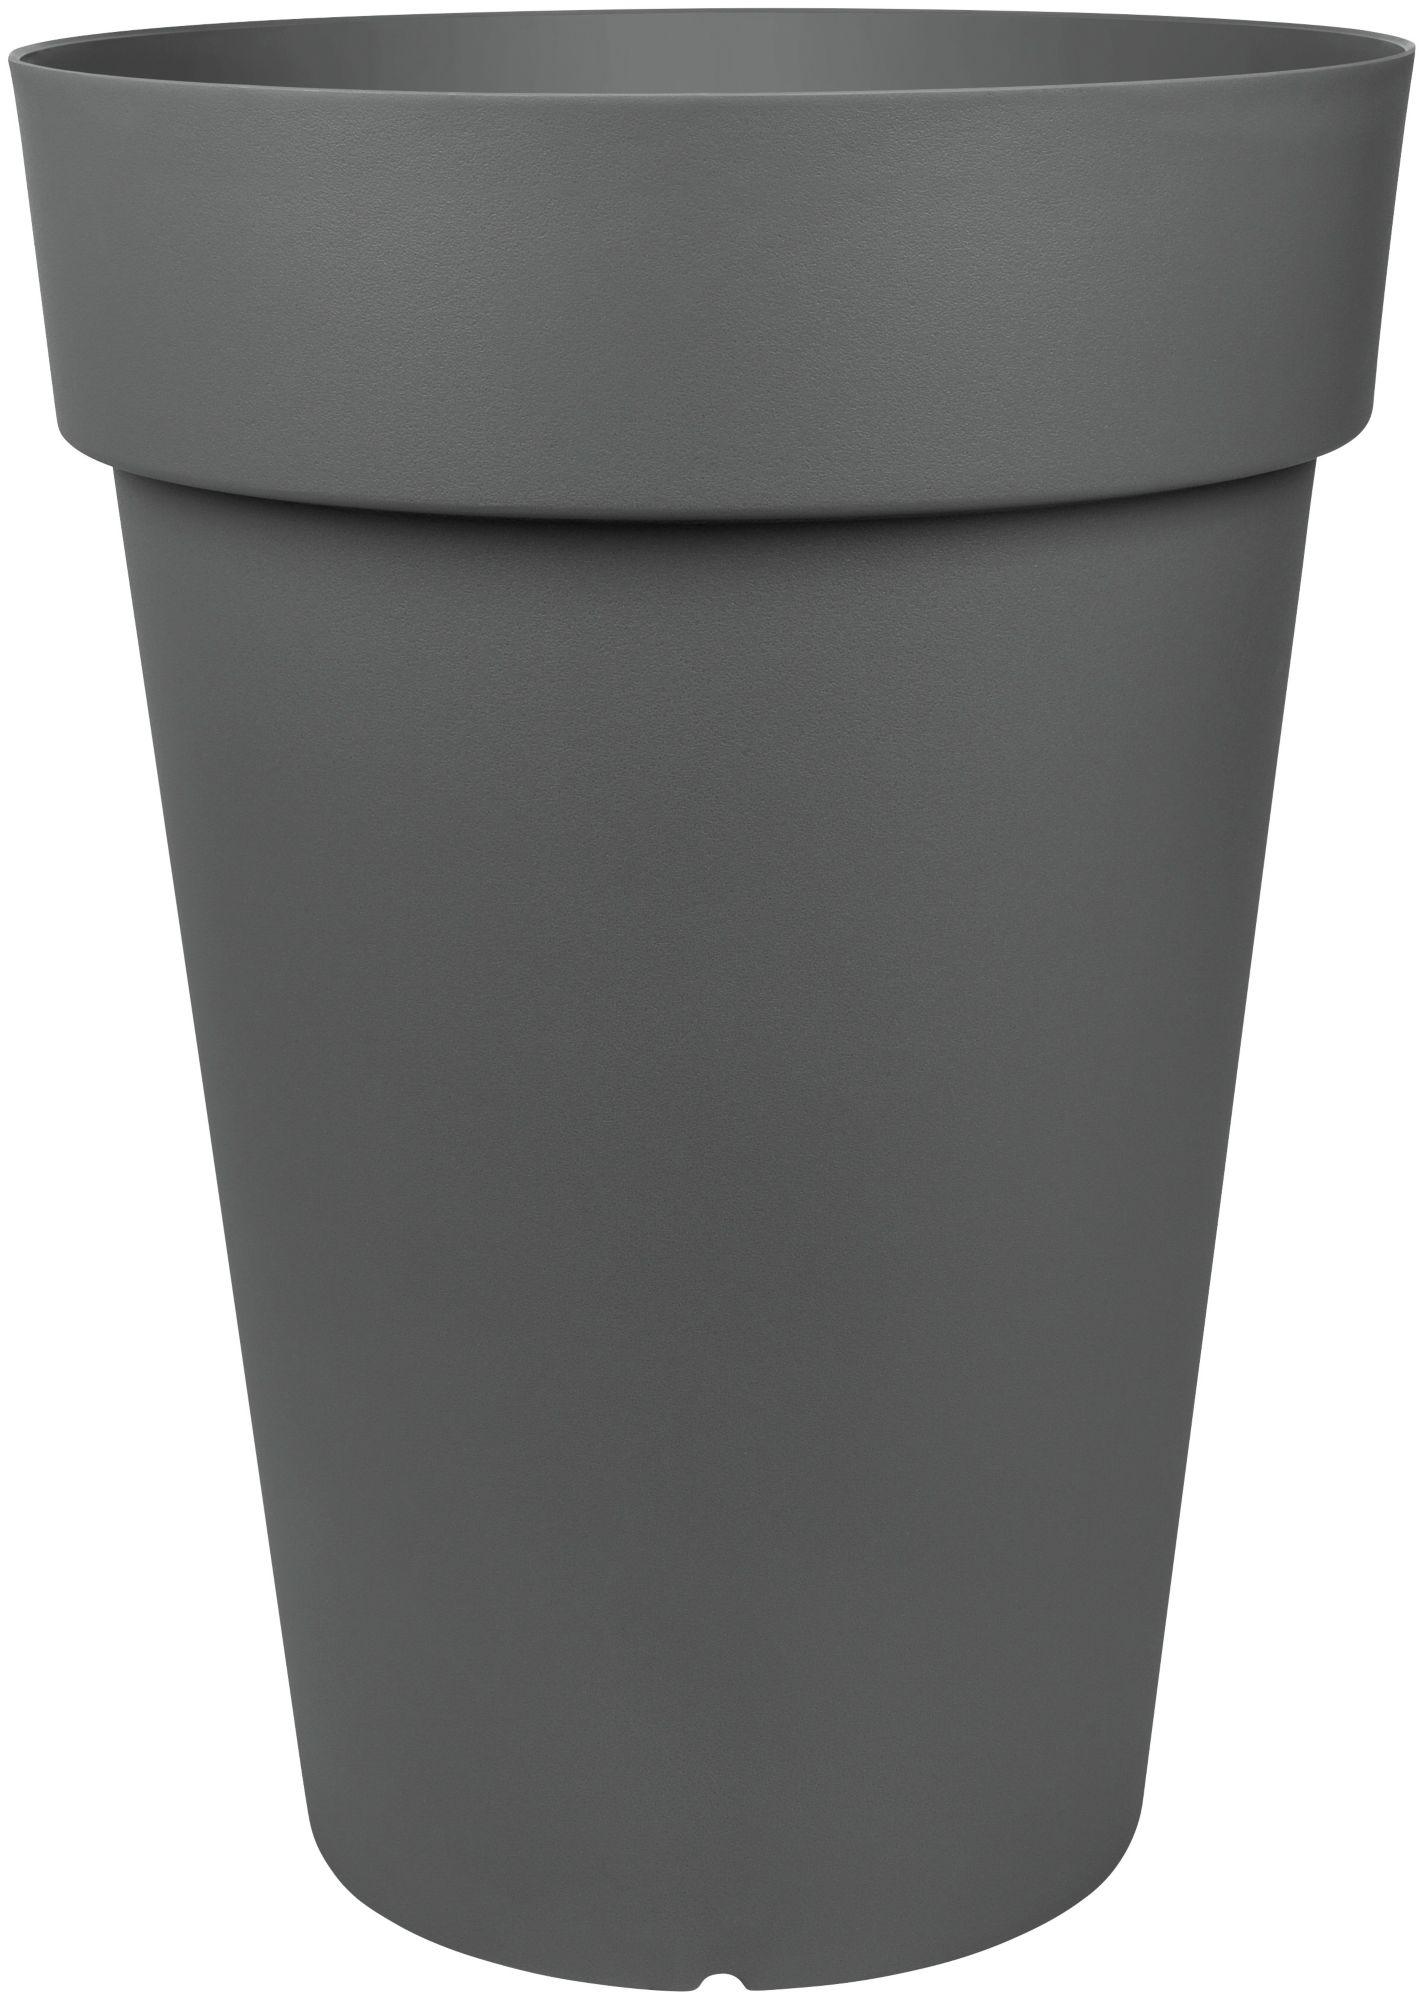 EMSA Emsa Blumenkasten »CITY CLASSIC Kübel«, Ø/H: 40/52 cm, granit